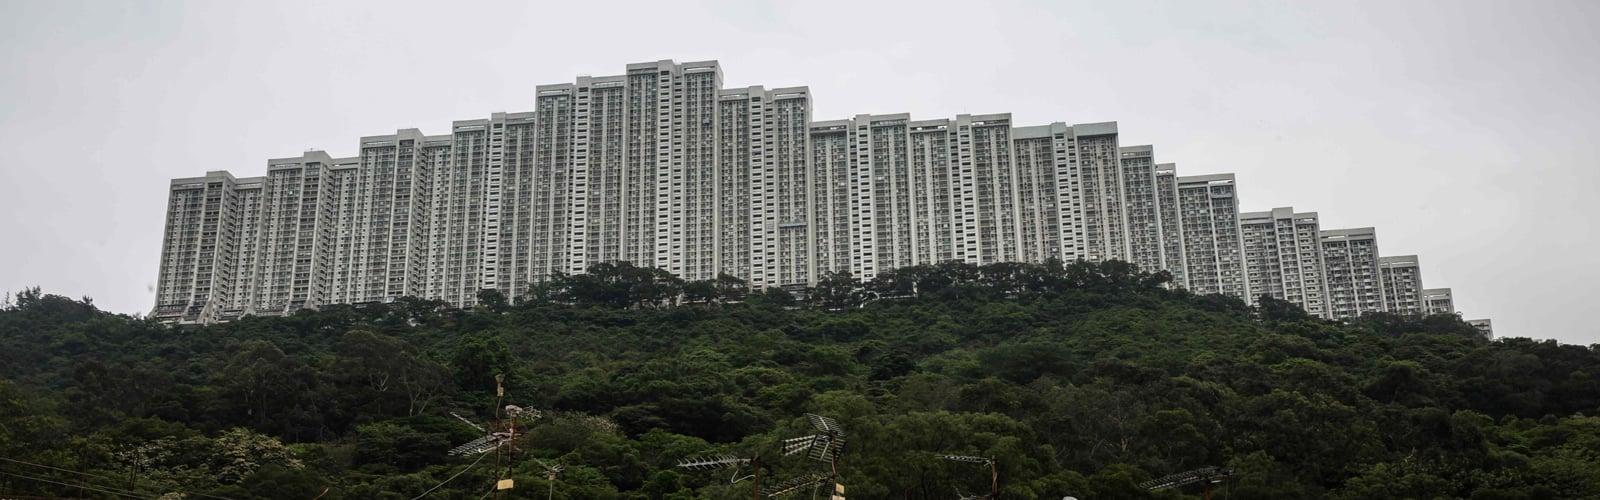 Wonderland Villas: A tale of Hong Kong´s property rollercoaster